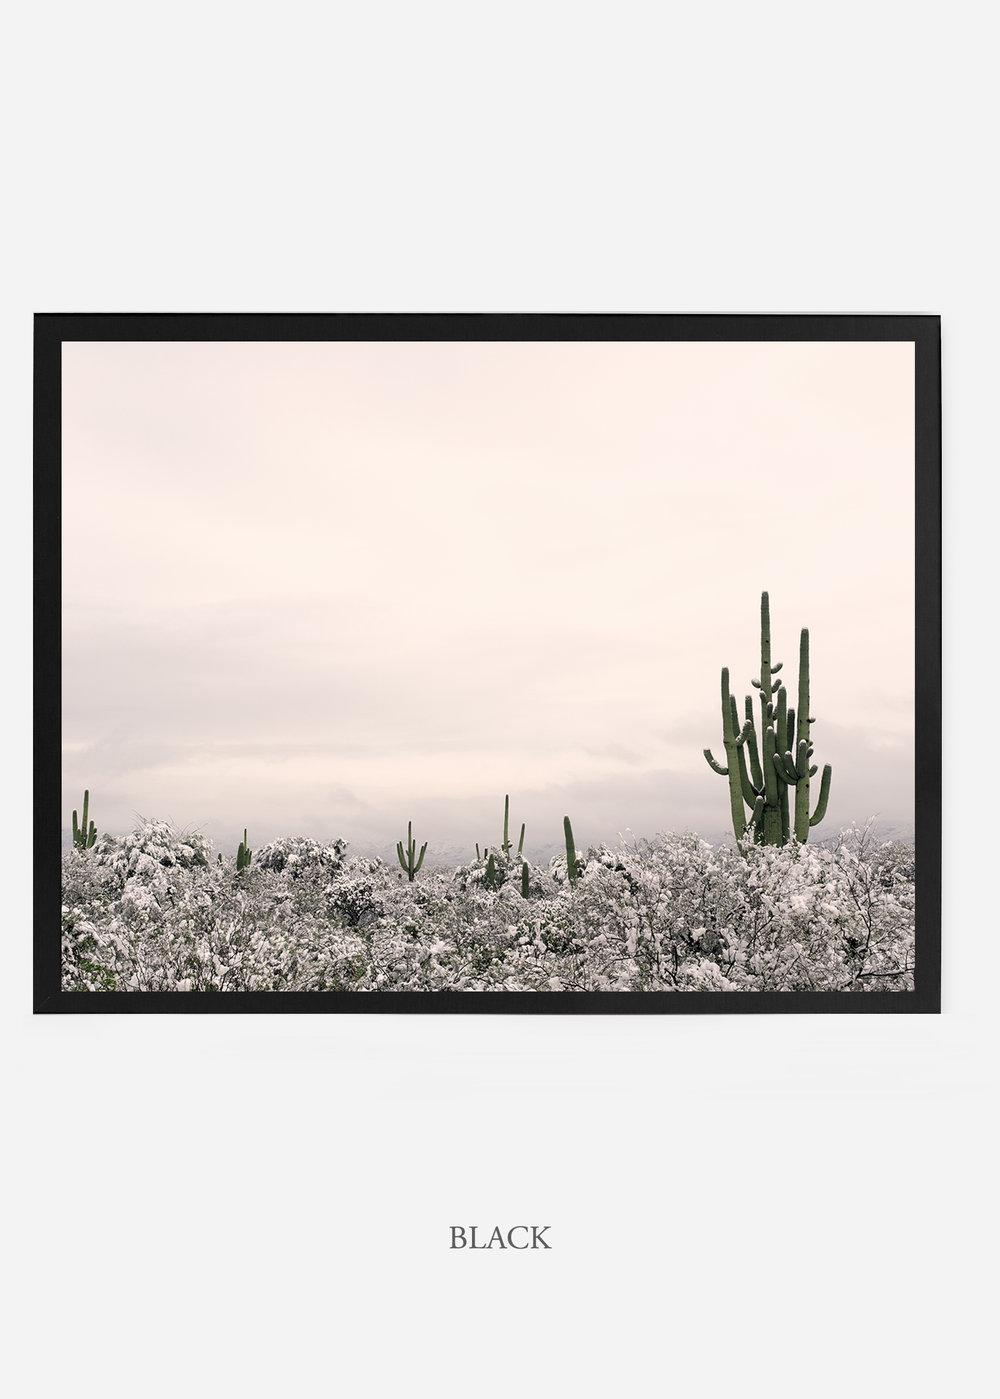 nomat_blackframe-saguaroNo.7-wildercalifornia-art-wallart-cactusprint-homedecor-prints-arizona-botanical-artwork-interiordesign.jpg